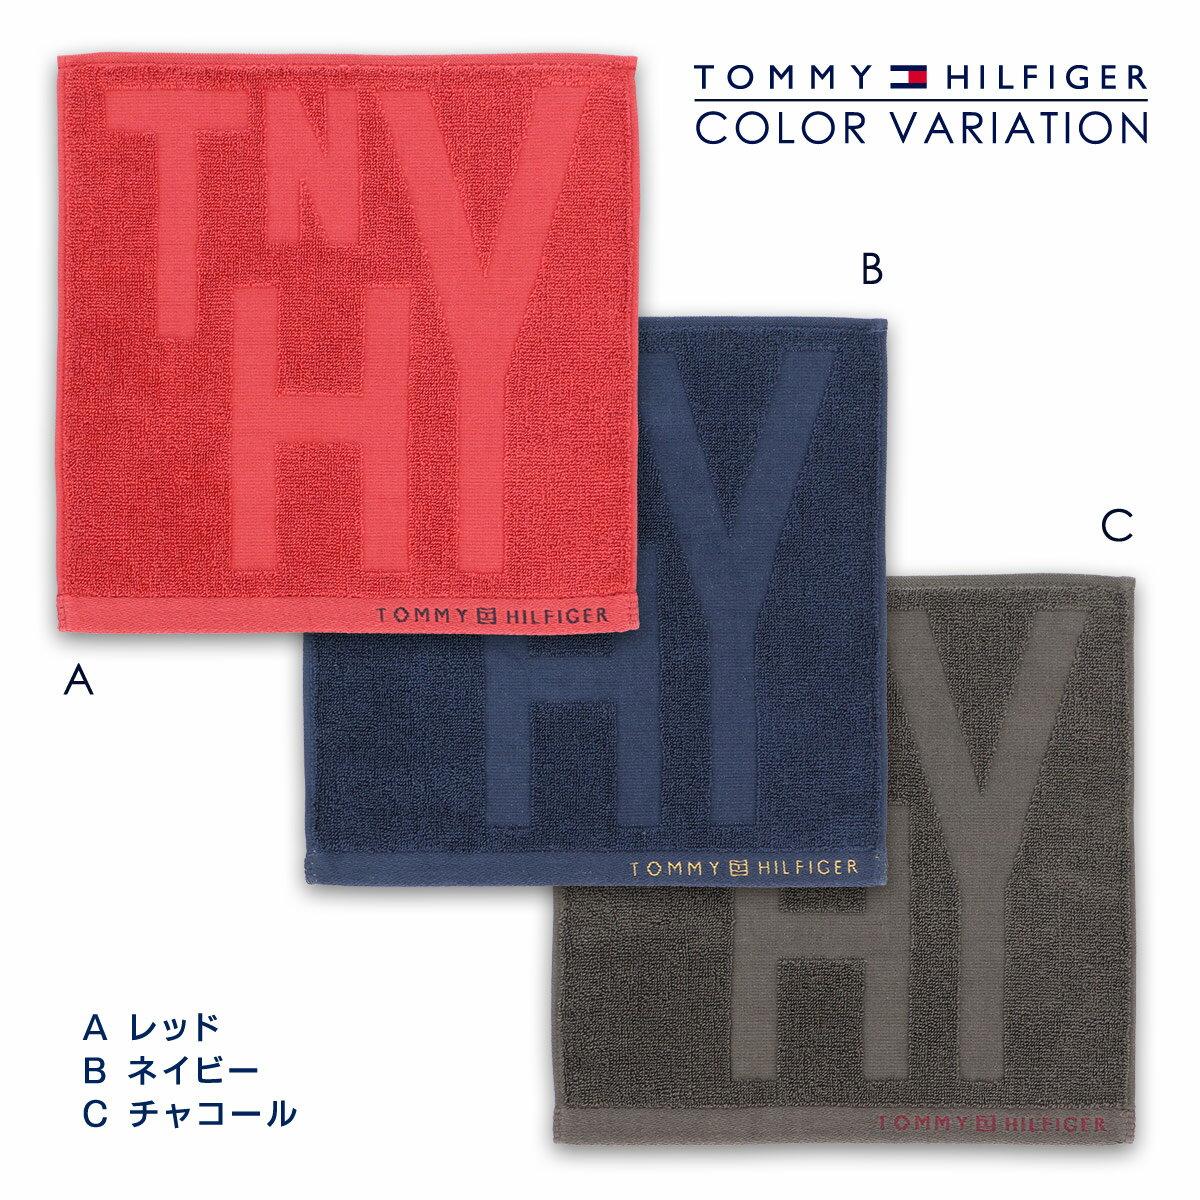 TOMMYHILFIGER(トミーヒルフィガー)『タオルハンカチ』